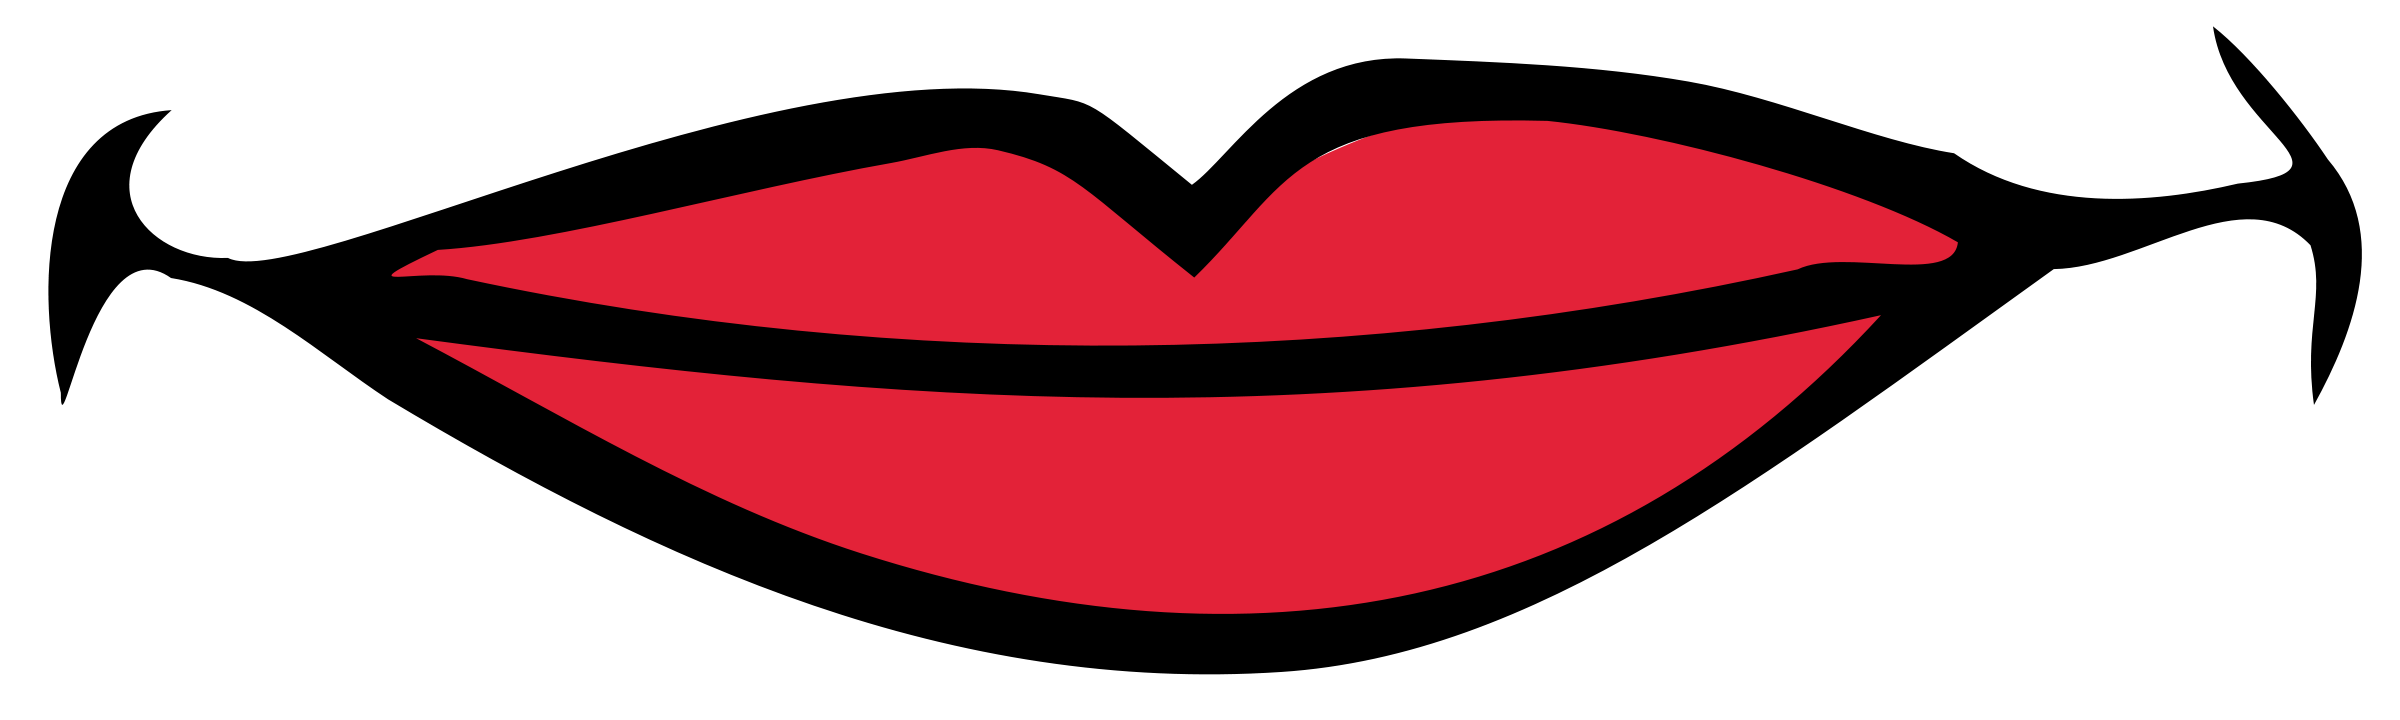 mouth smile clip art